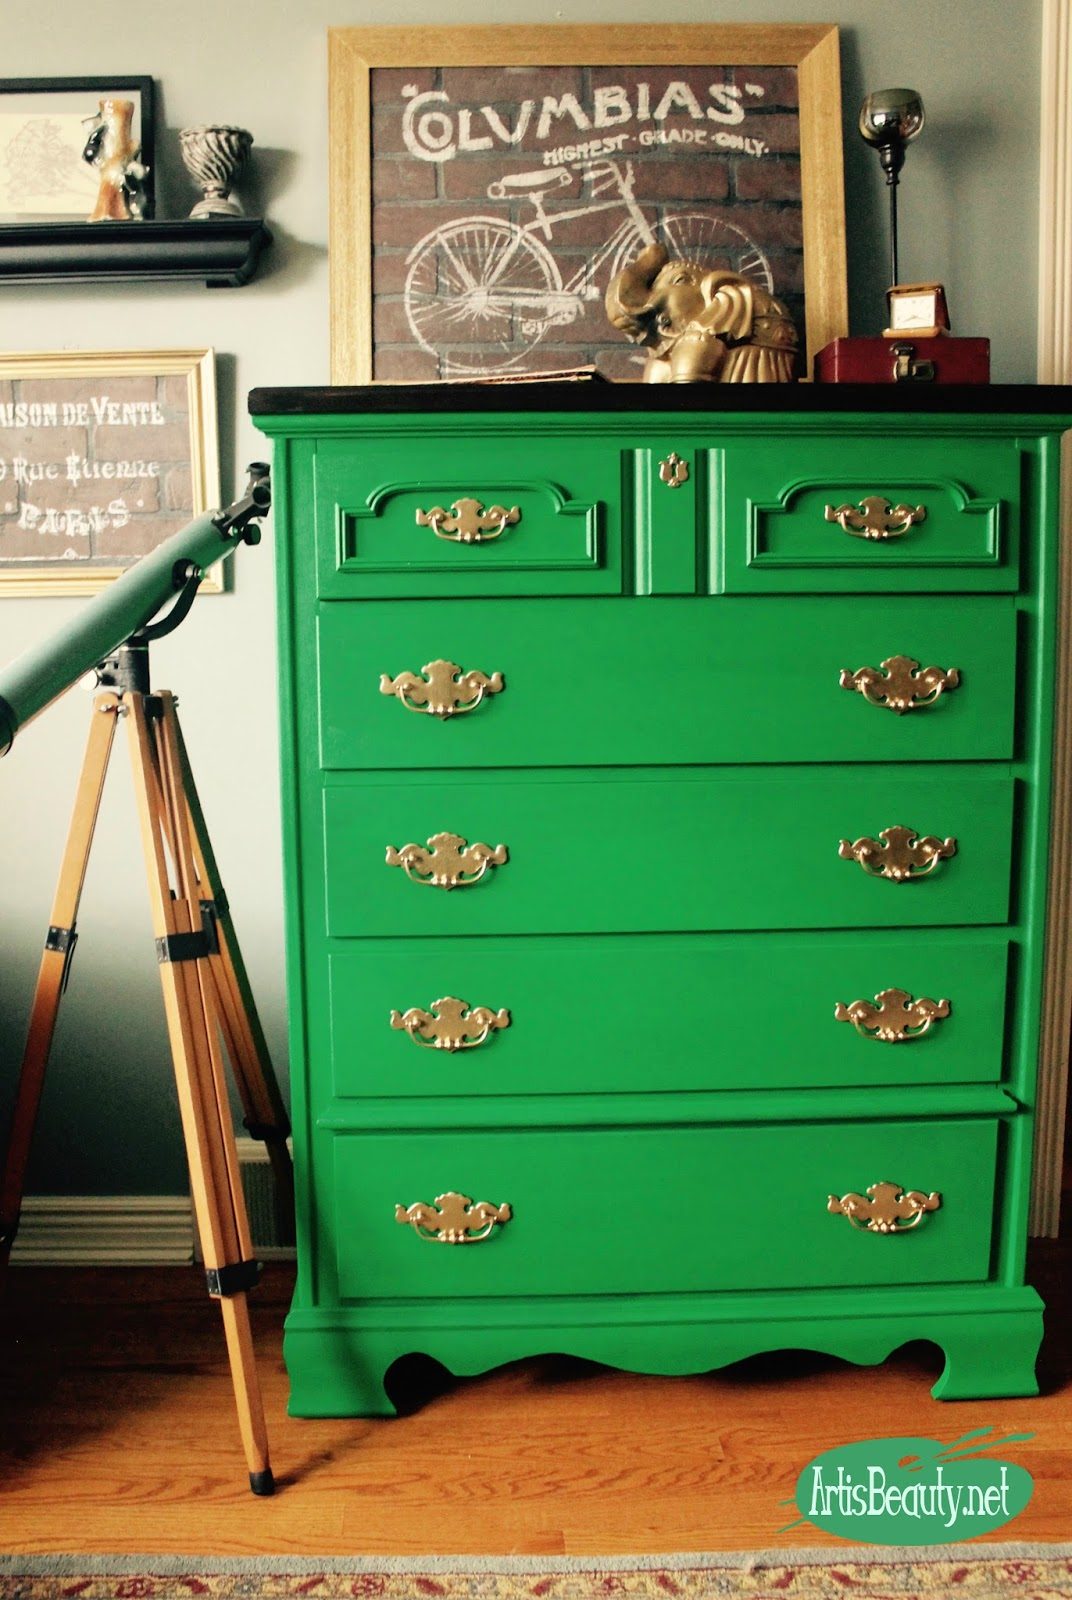 art is beauty emerald green rescued dresser before and after boho chic emerald green roadside rescue dresser painted makeover before and after eclectic home decor artisbeauty